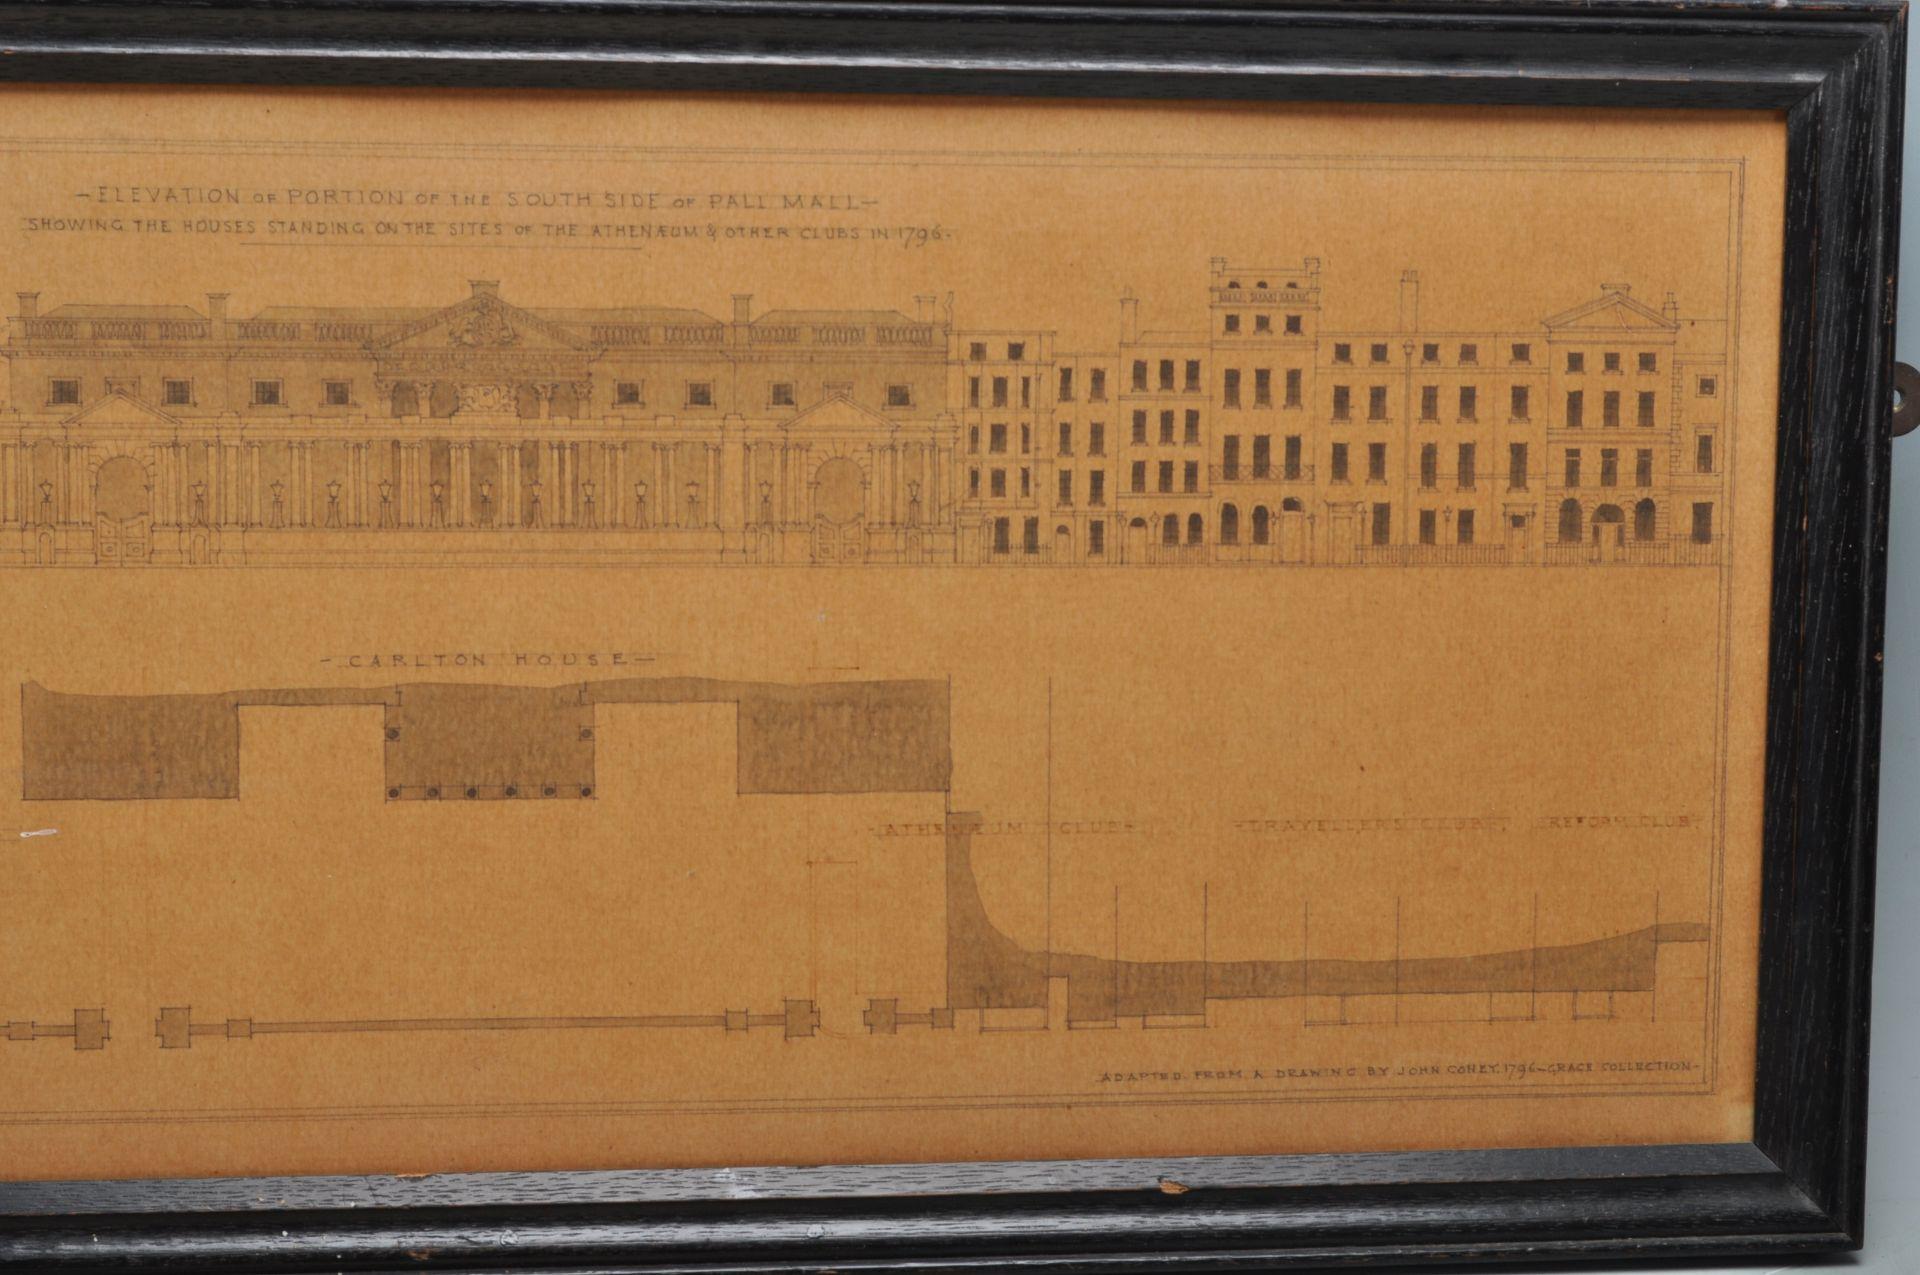 COLLECTION OF ANTIQUE LONDON RELATED MAPS & PLANS - Bild 9 aus 10